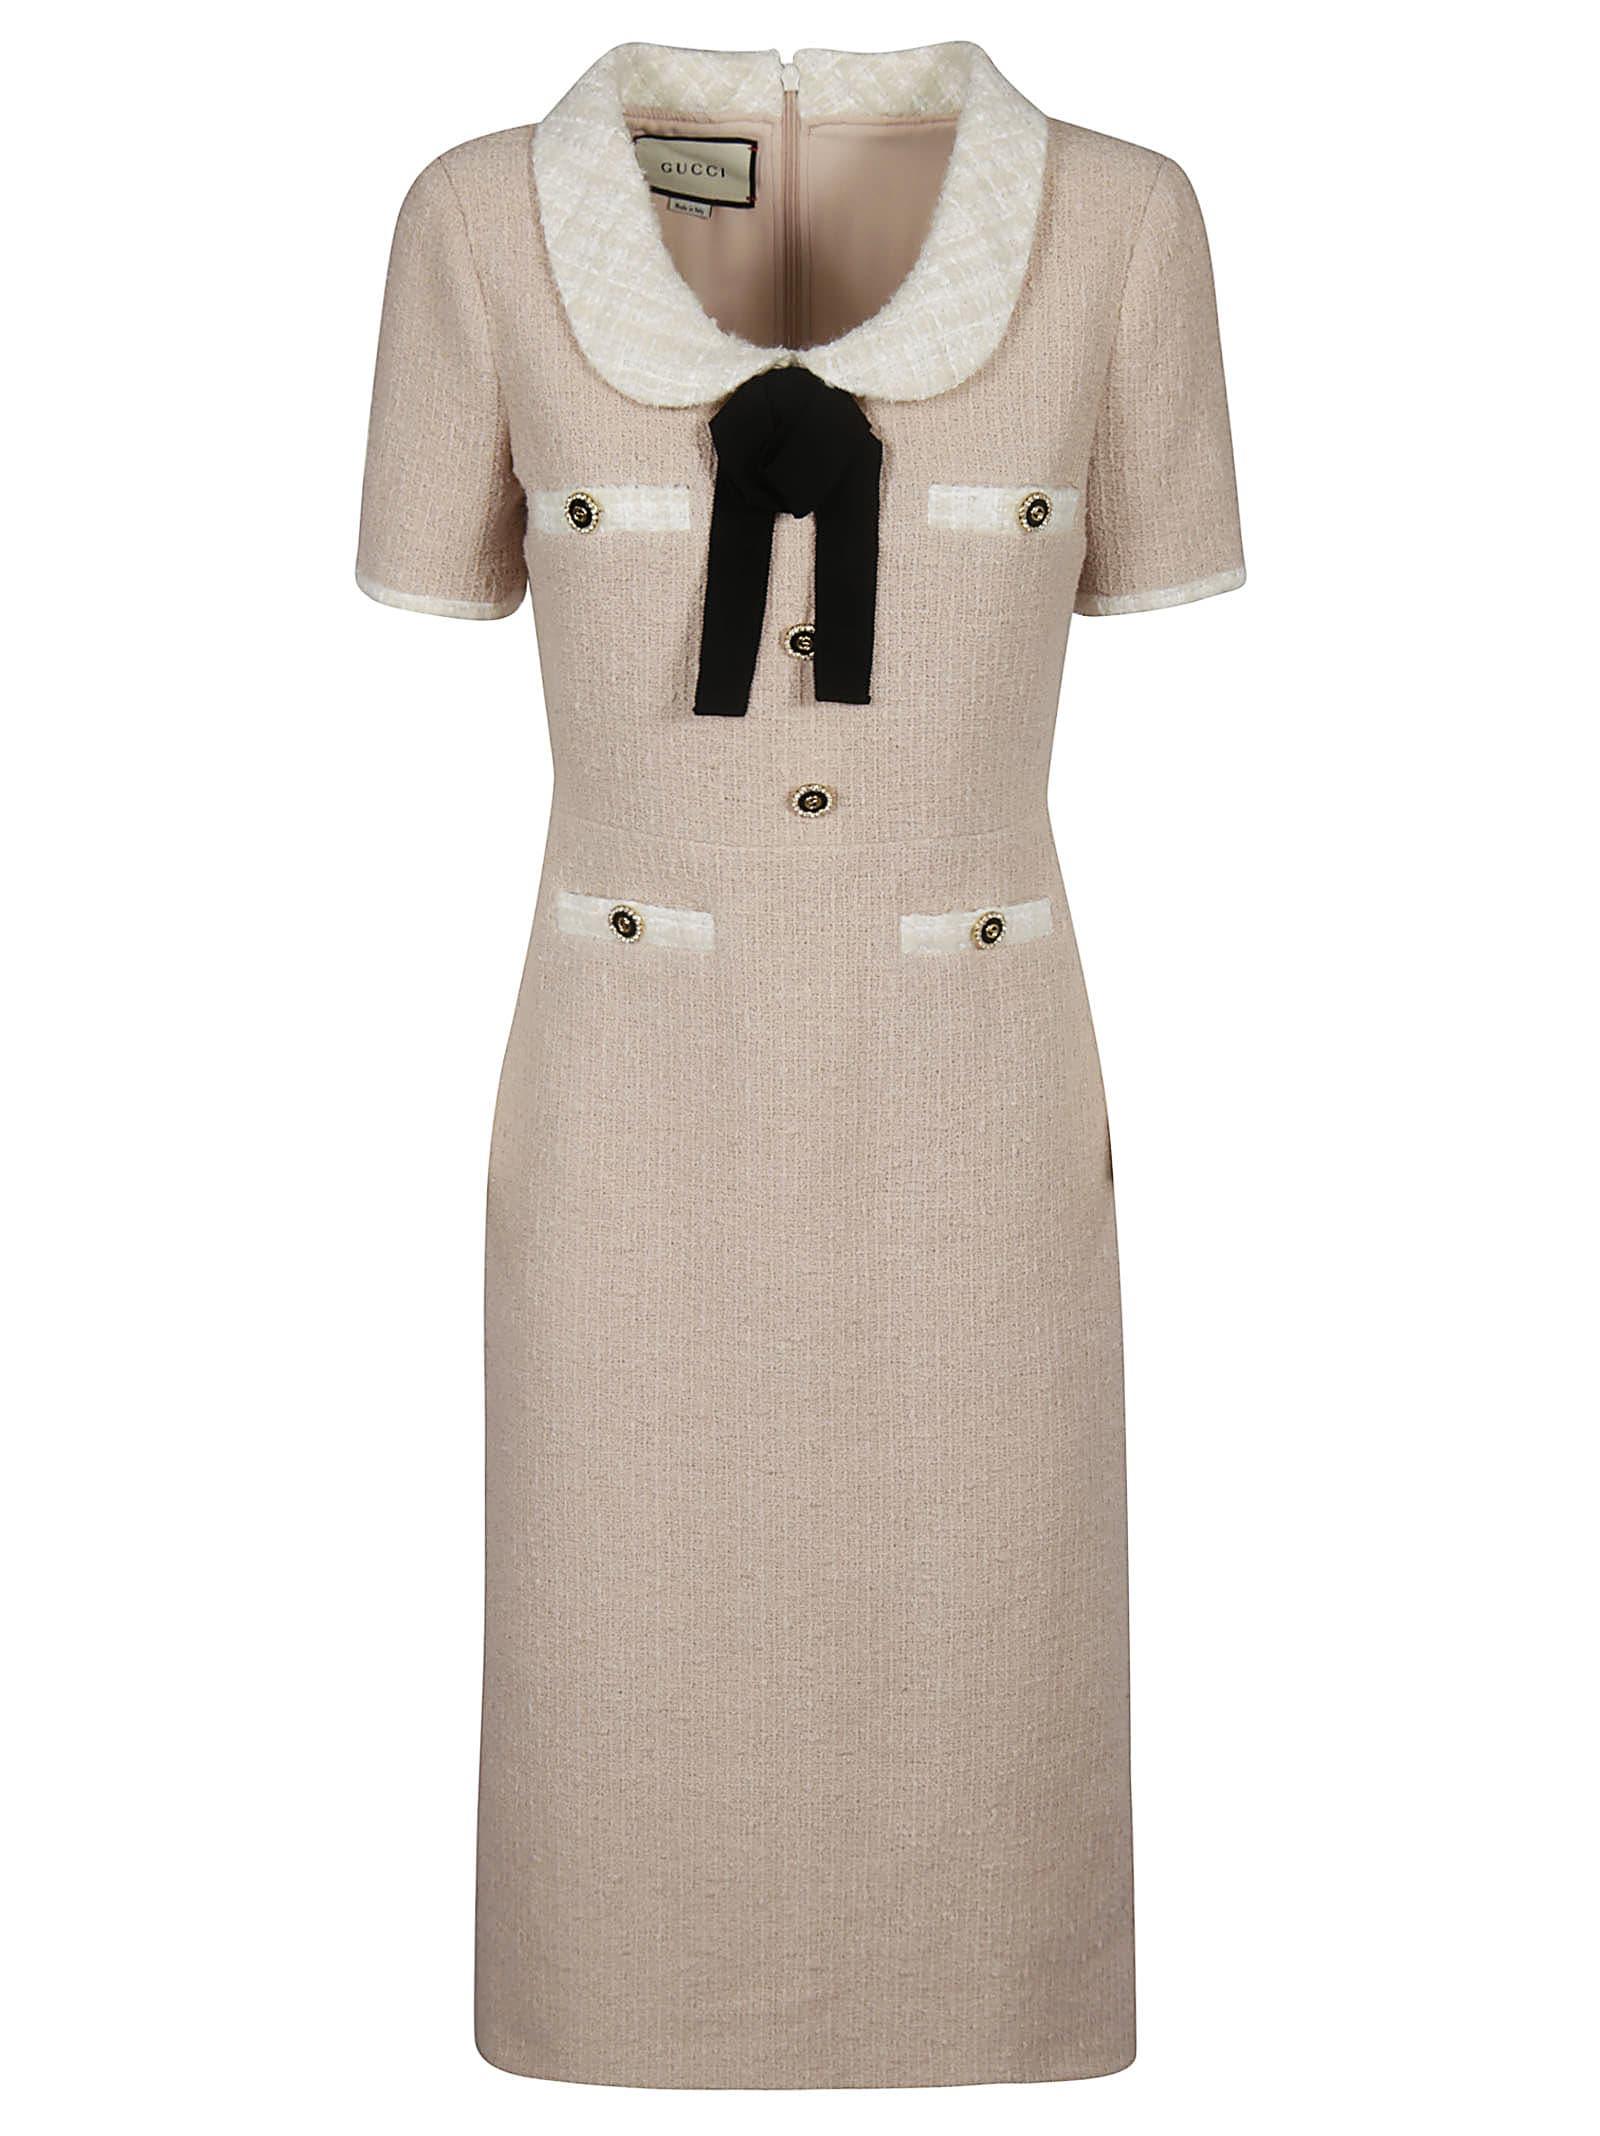 Gucci Tweed Boucle Dress